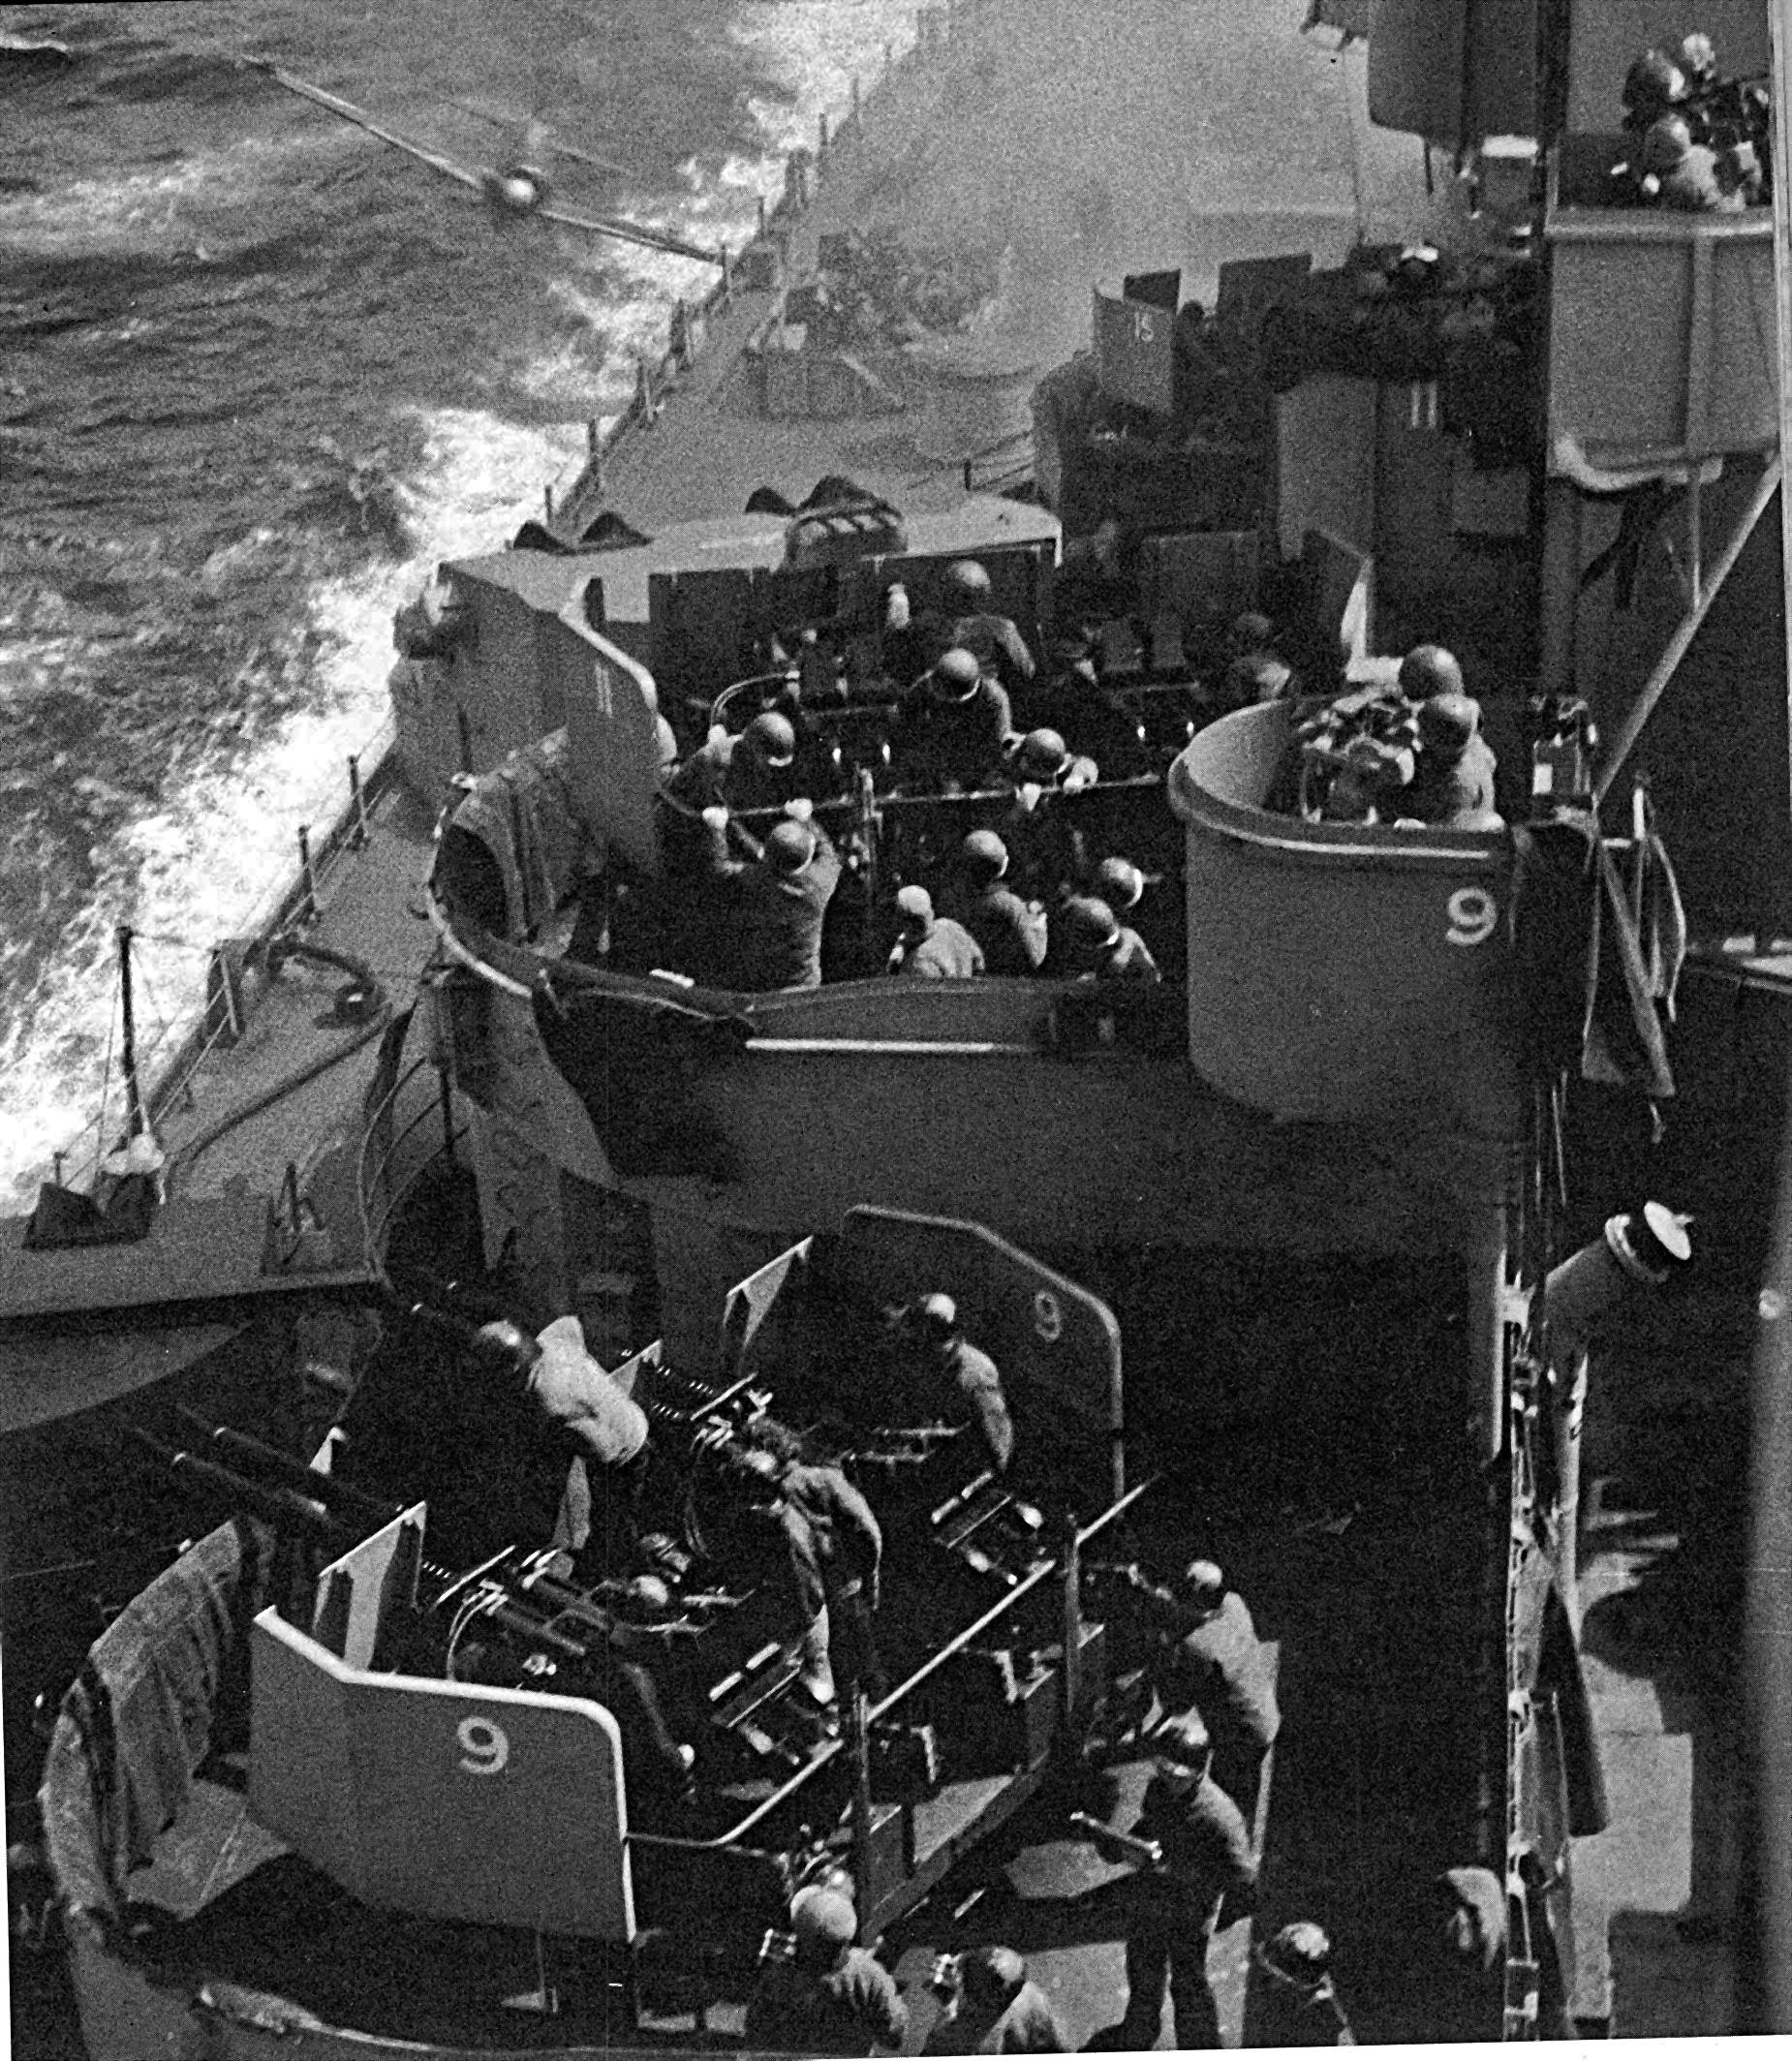 File:USS Missouri Zero Kamikaze.jpg - Wikimedia Commons